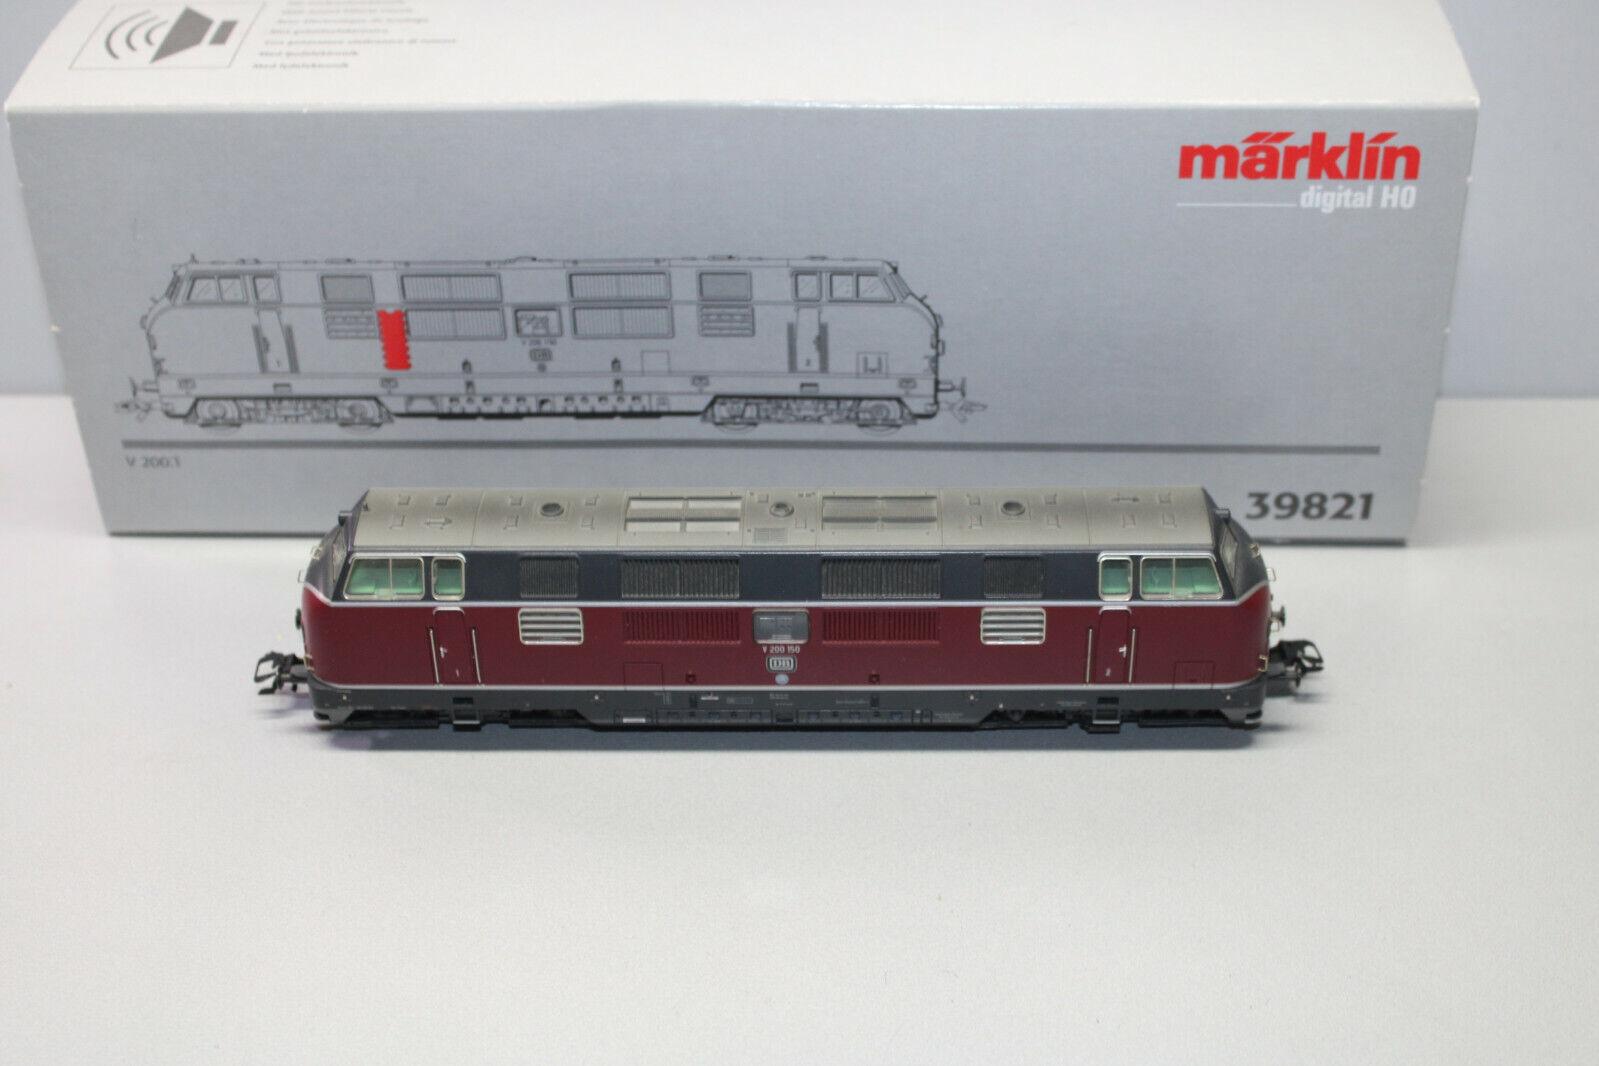 marklin 39821 digitale diesel serie v200 150 dB suono h0 OVP